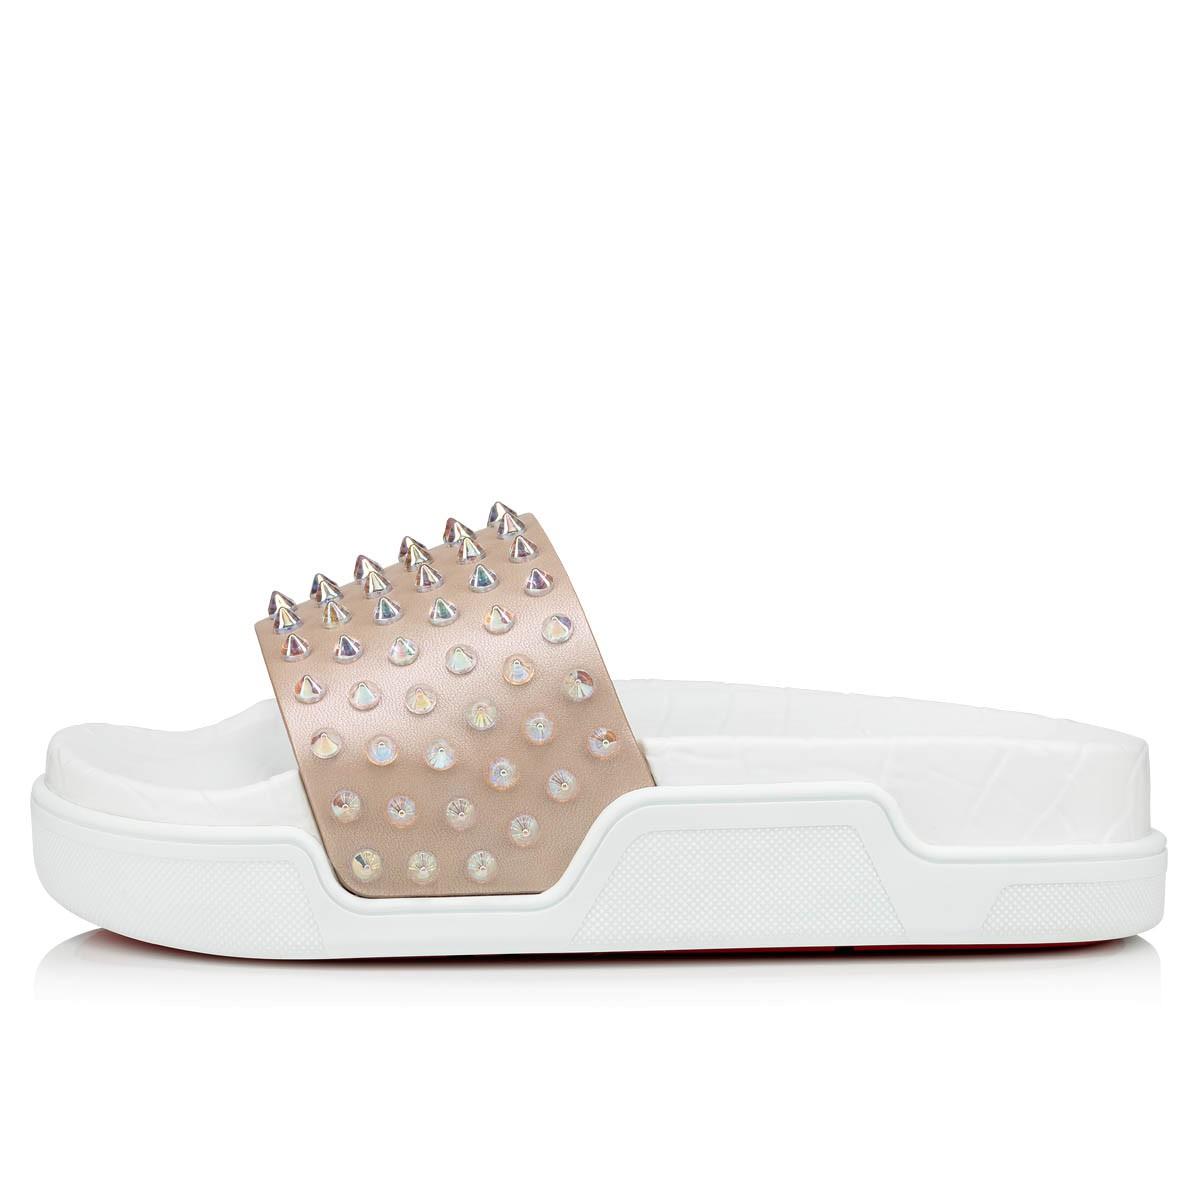 Shoes - Pool Fun Donna Flat - Christian Louboutin